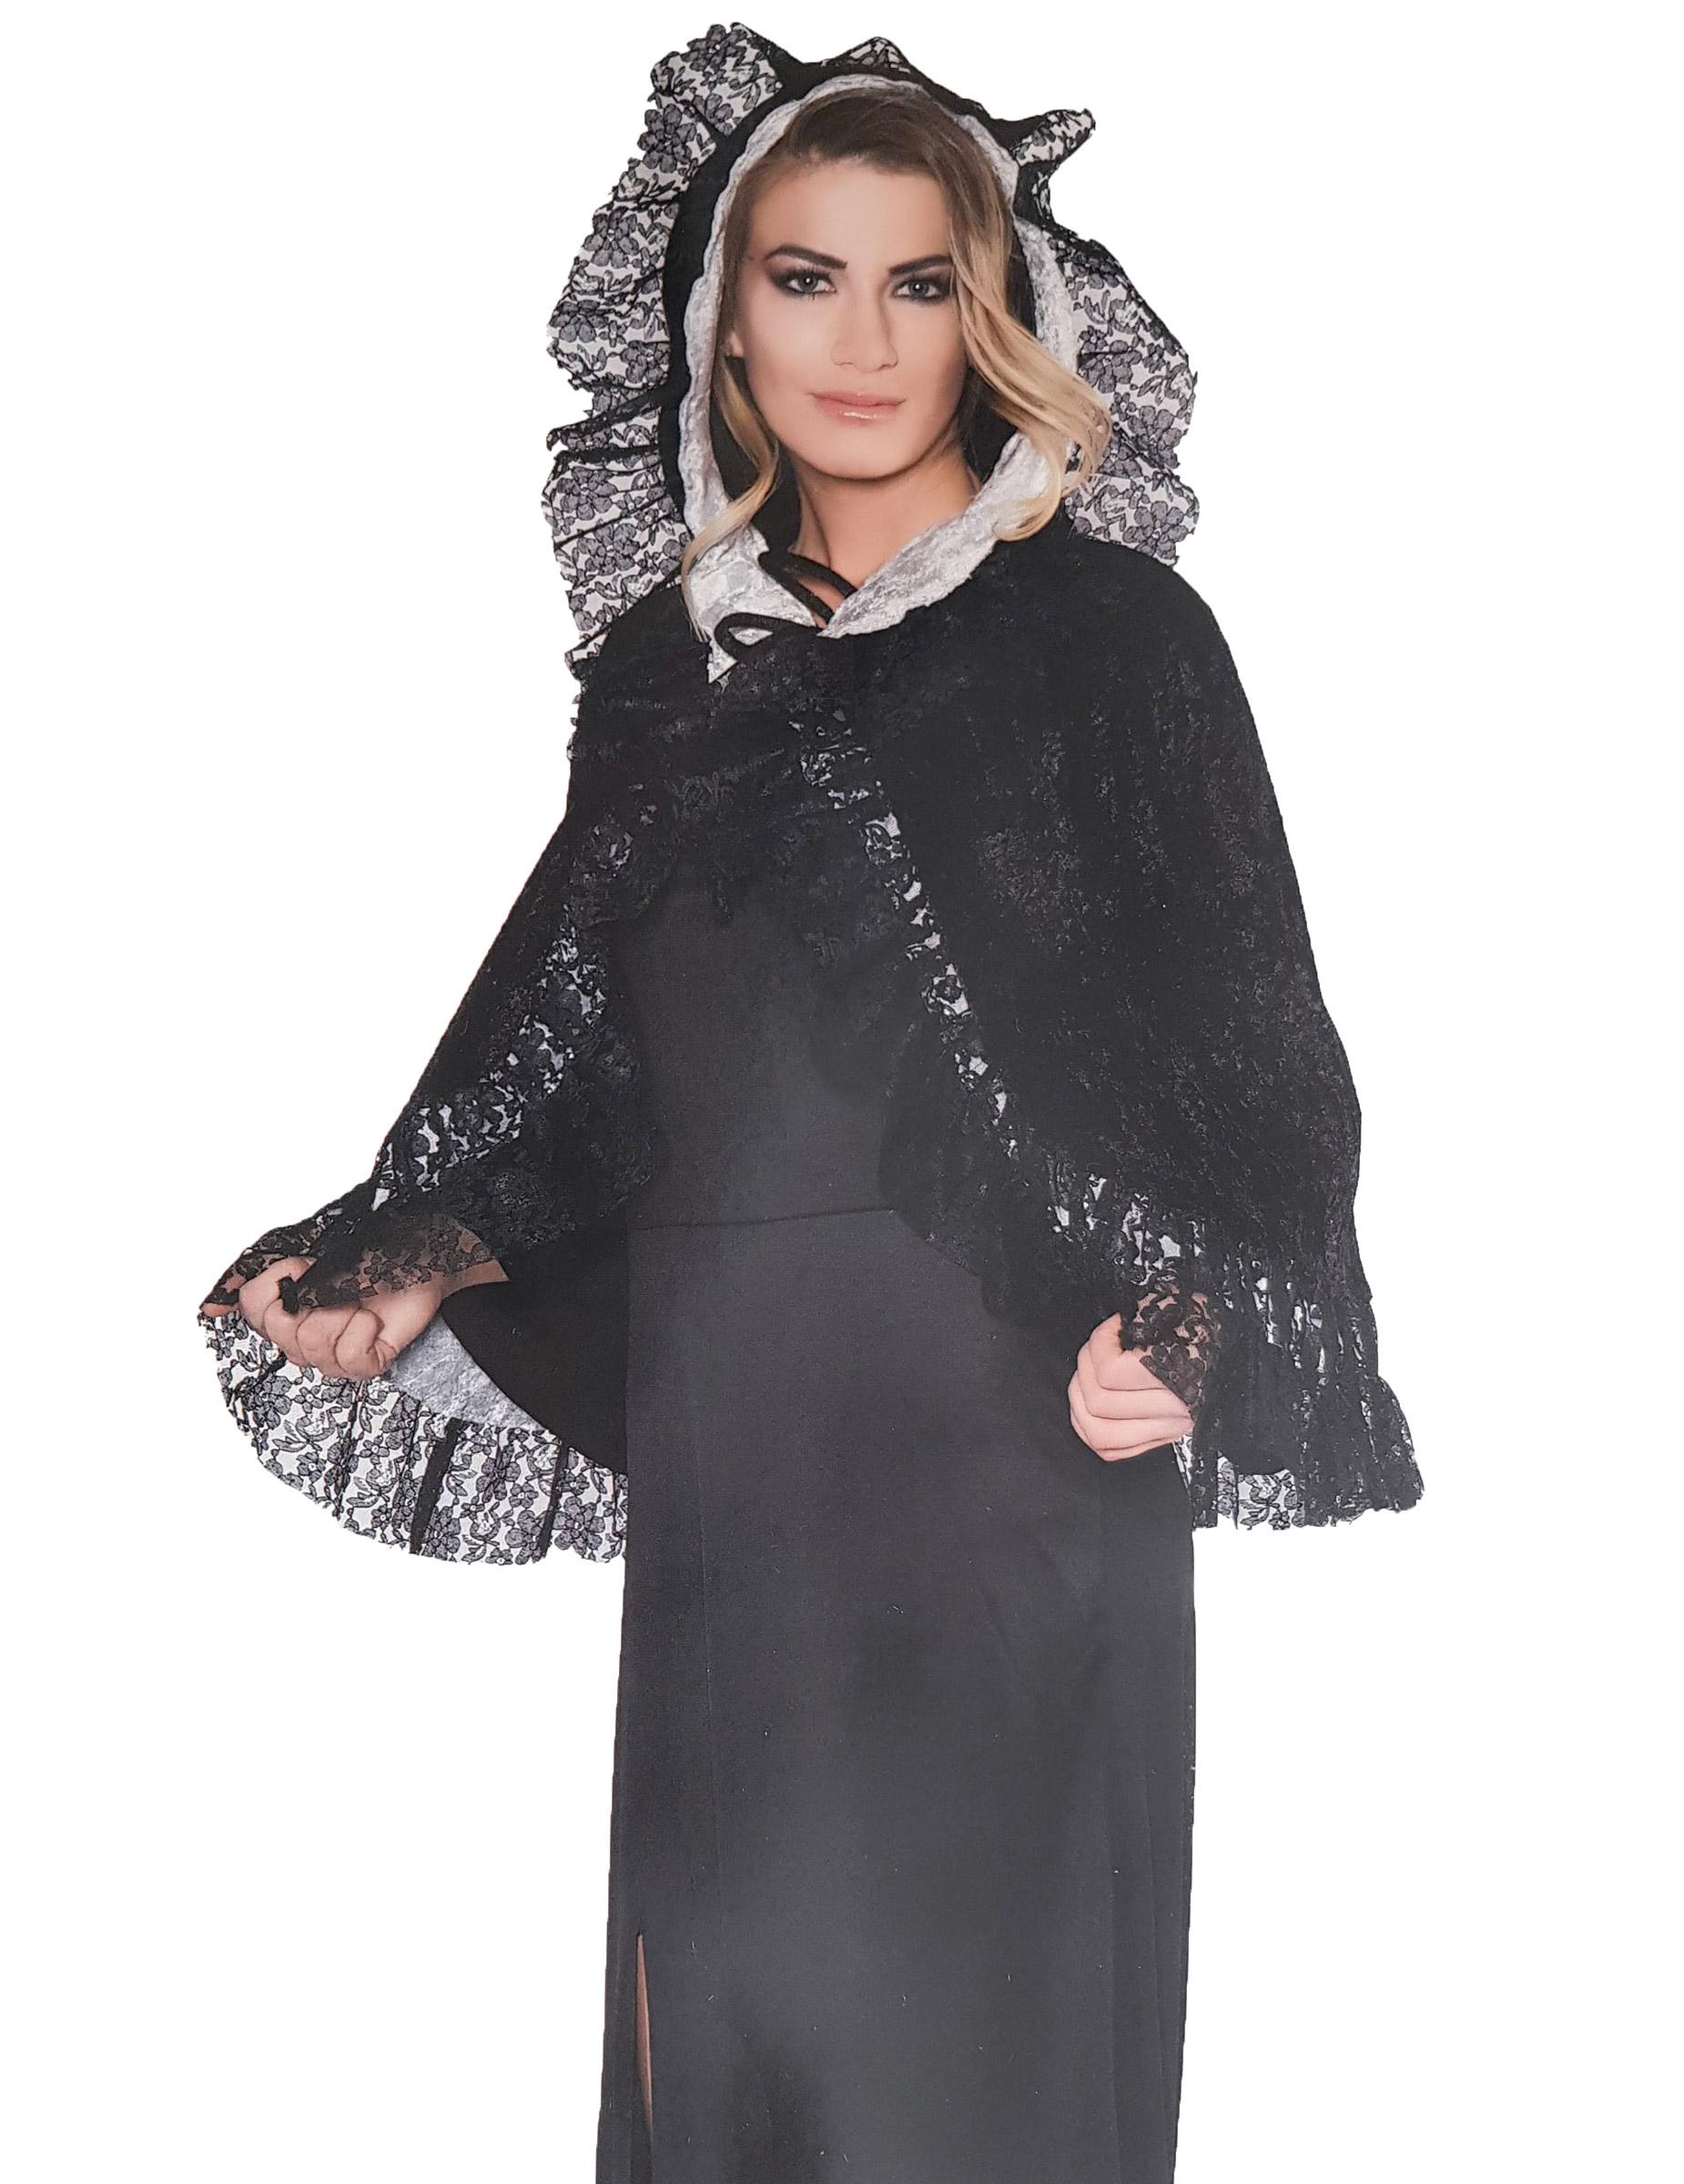 Spitzen Umhang Fur Damen Kostum Accessoire Schwarz Gunstige